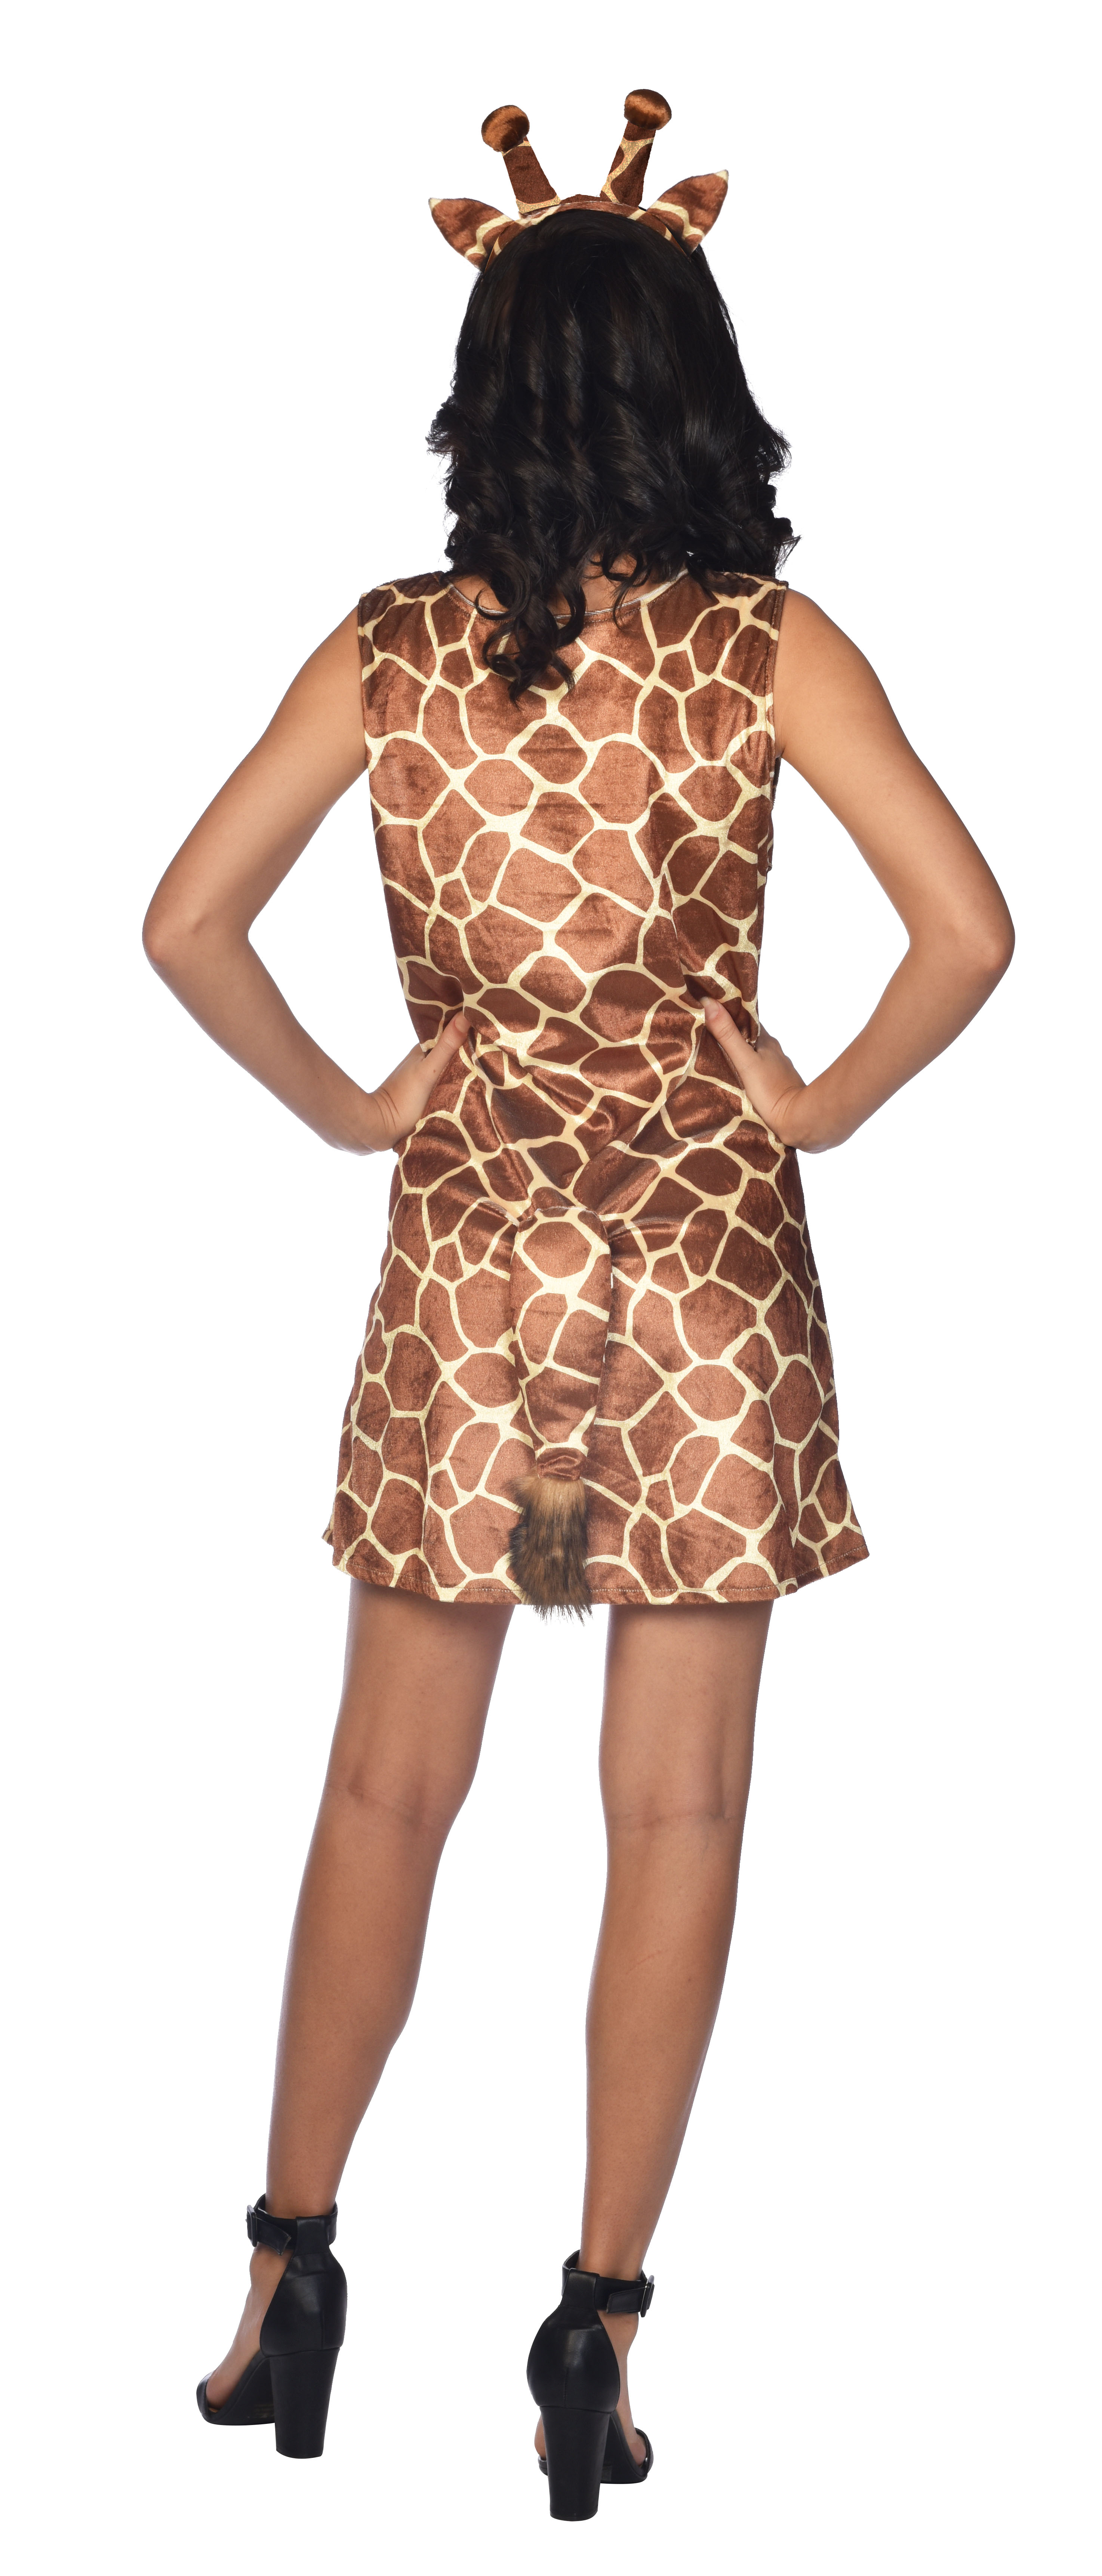 Indexbild 10 - Adult Ladies Zoo Safari Animal Giraffe Lady Fancy Dress Costume Womens Outfit